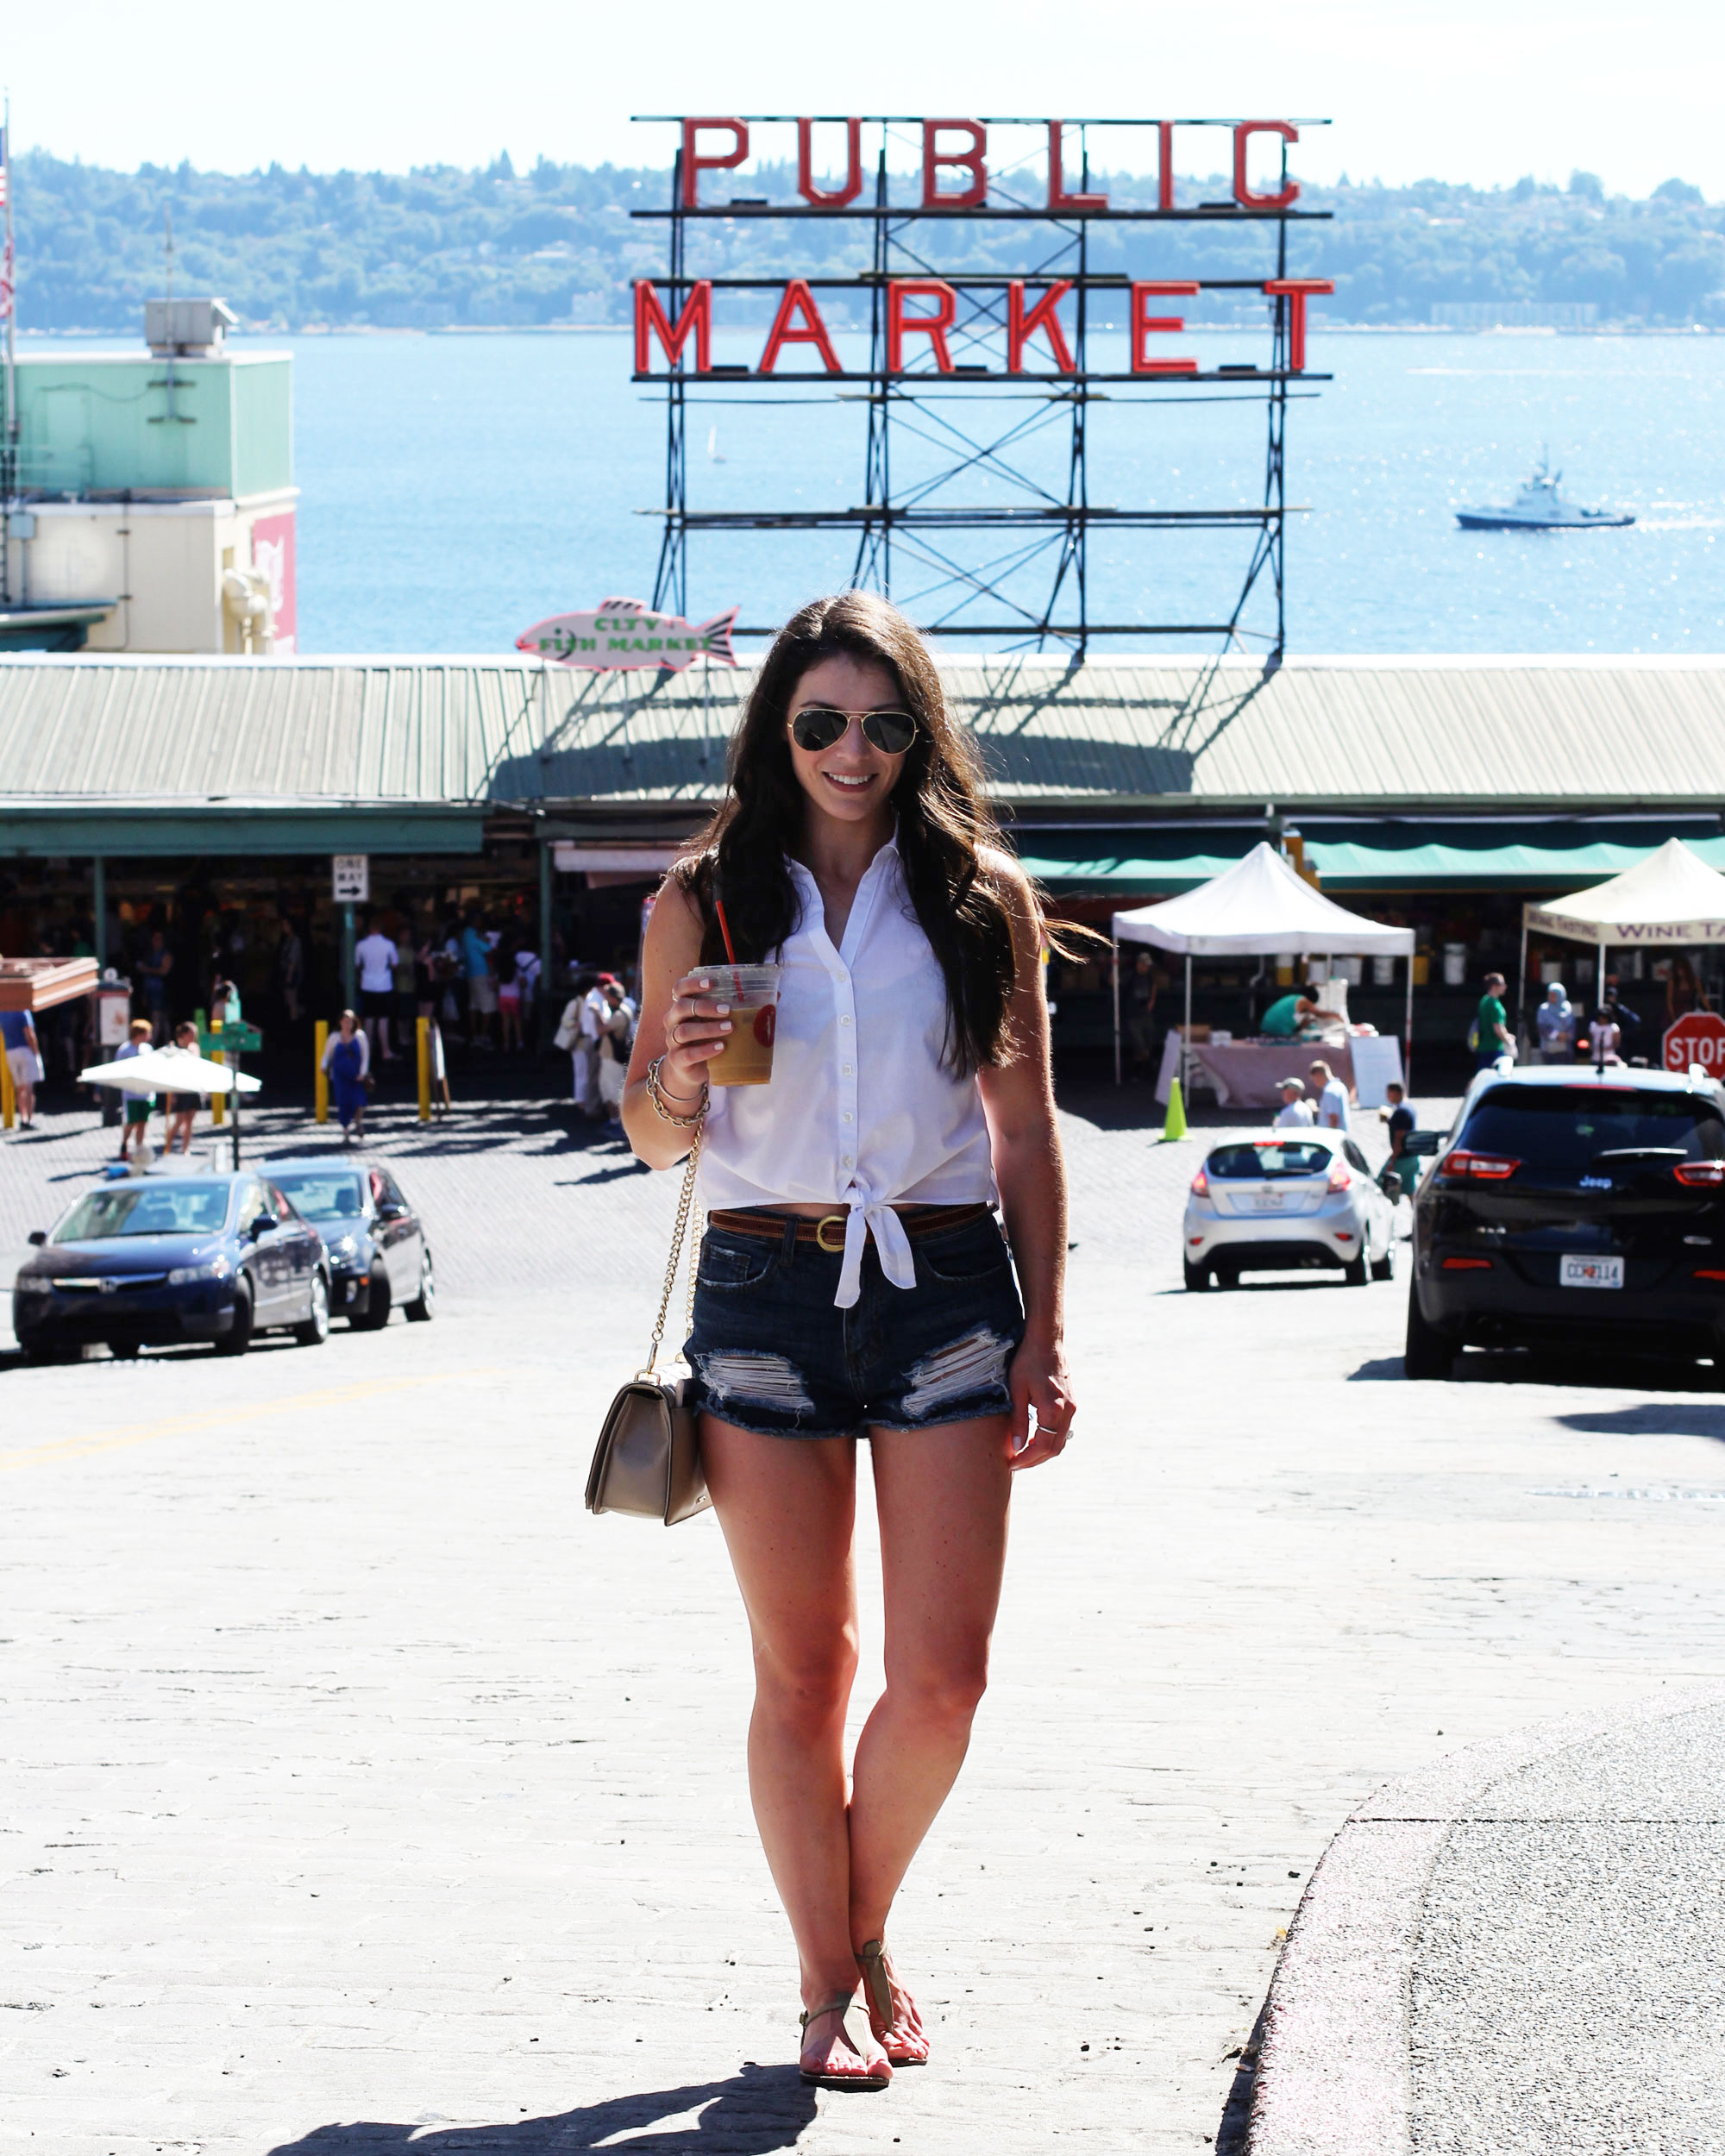 Seattle Fashion Blogger, Pike Place Market, Summer Style, White Button Up, Tie Blouse, Cutoff Denim Shorts, Sam Edelman Gigi Sandals